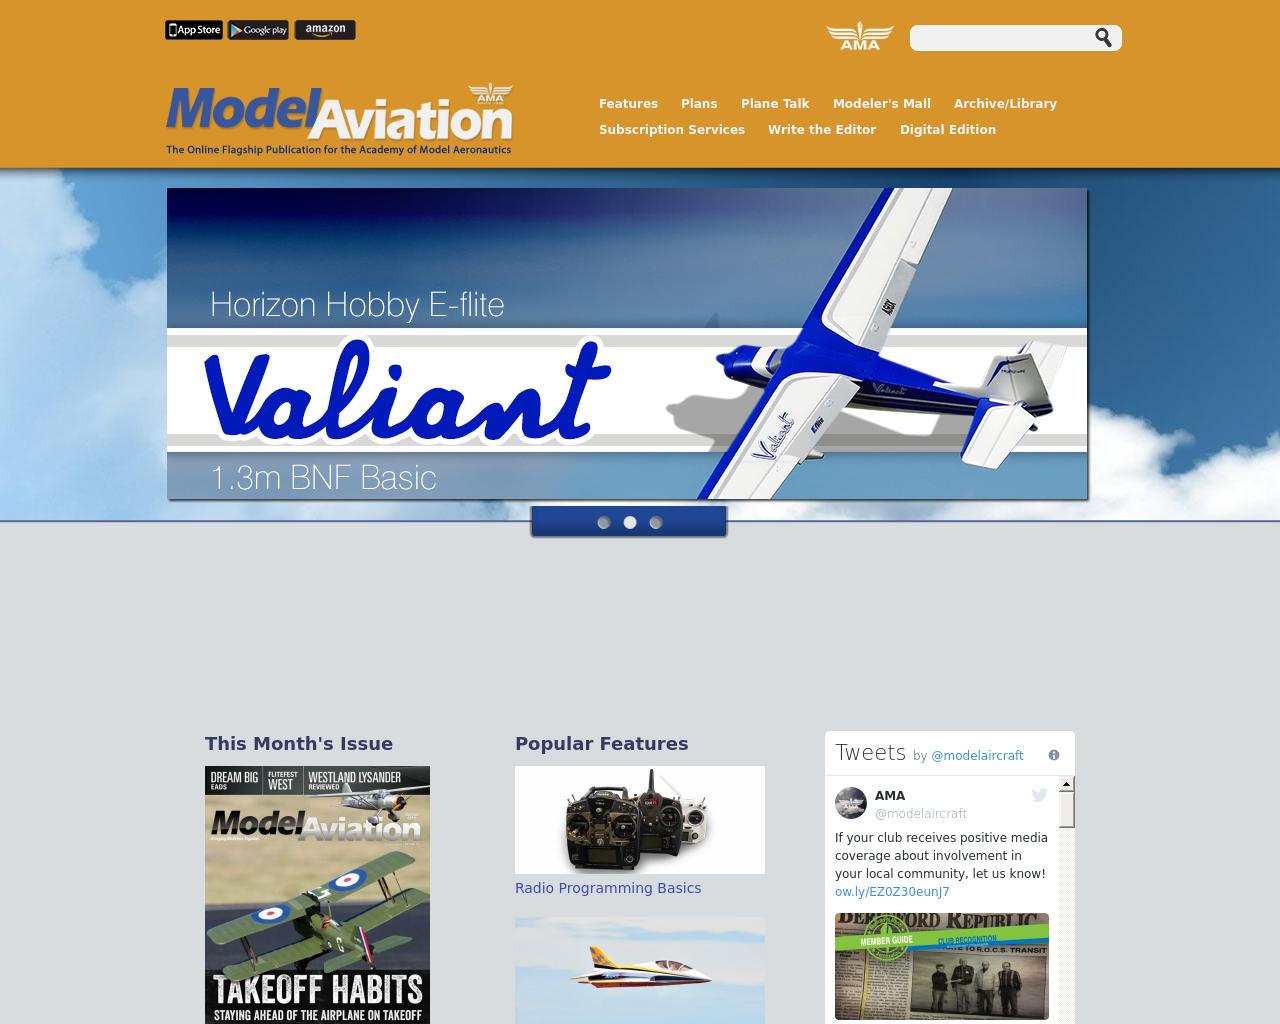 Airborne-Media-Advertising-Reviews-Pricing